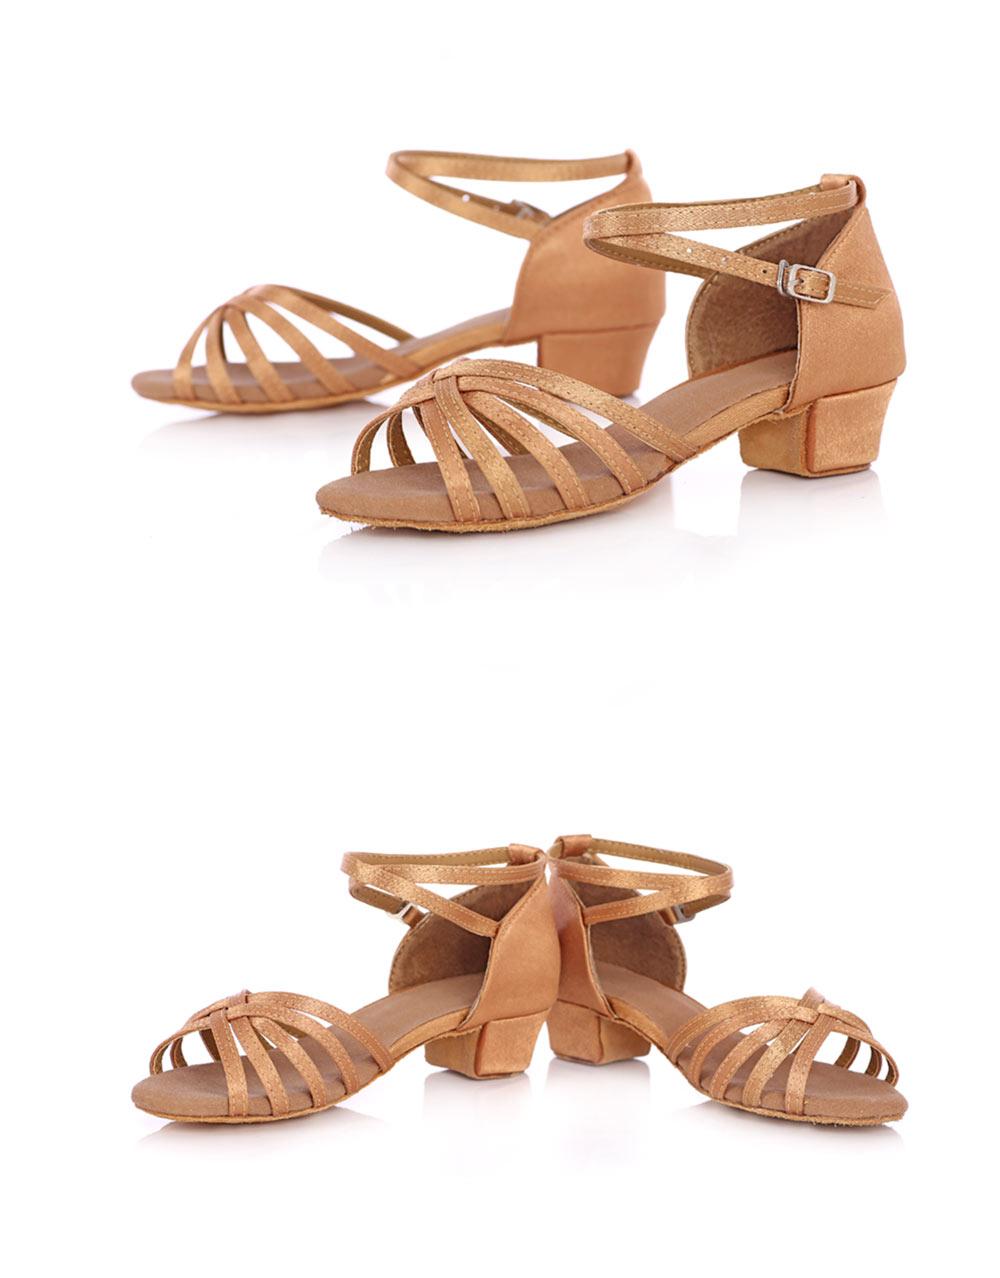 New Arrival Ballroom Tango Latin Dance Shoes High Quality Latin Woman Dancing Shoe Wholesale Women'S Heel Shoes Fast Shipping (9)